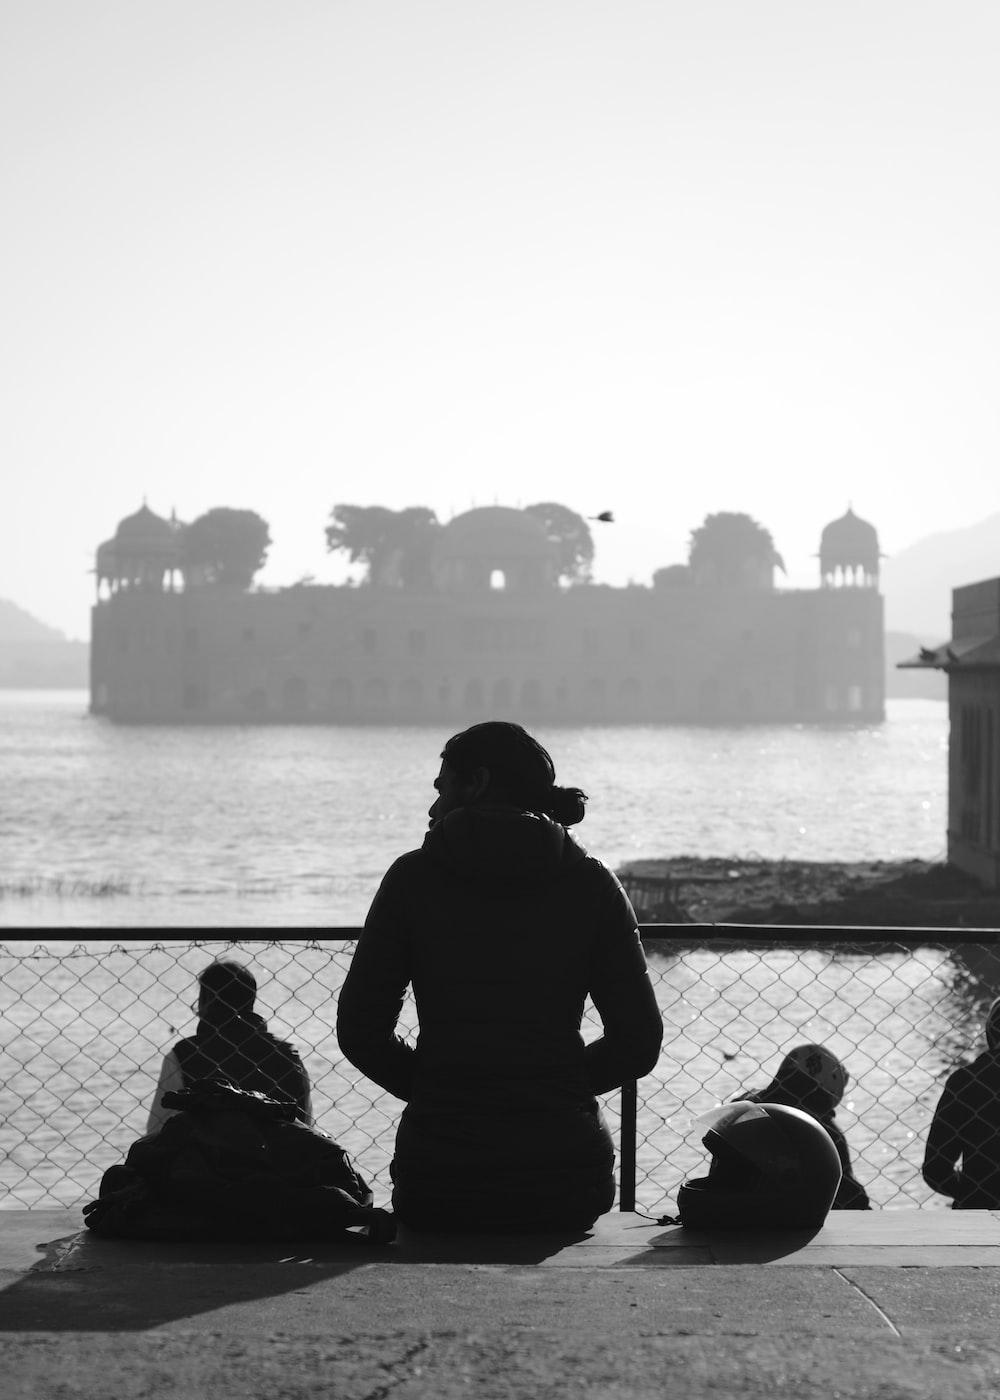 man in black jacket and black backpack standing beside black metal fence during daytime